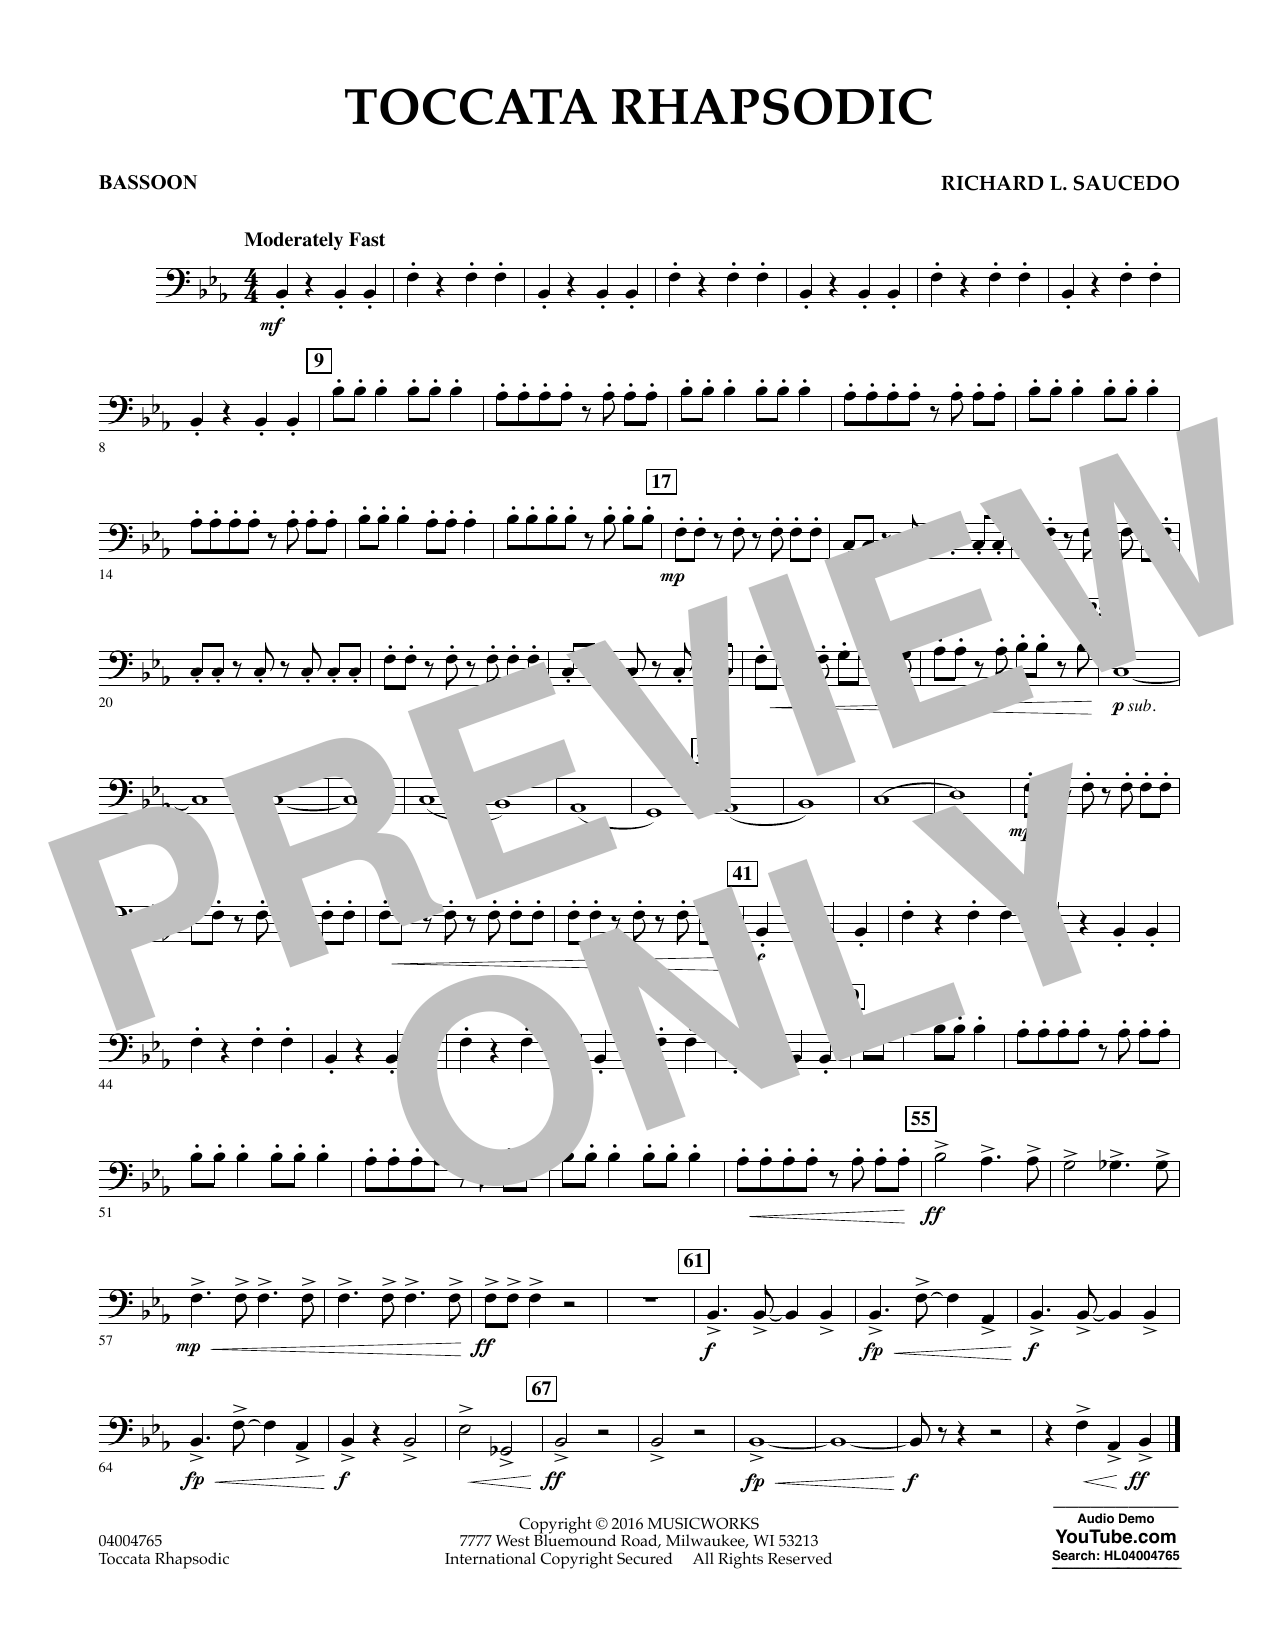 Toccata Rhapsodic - Bassoon